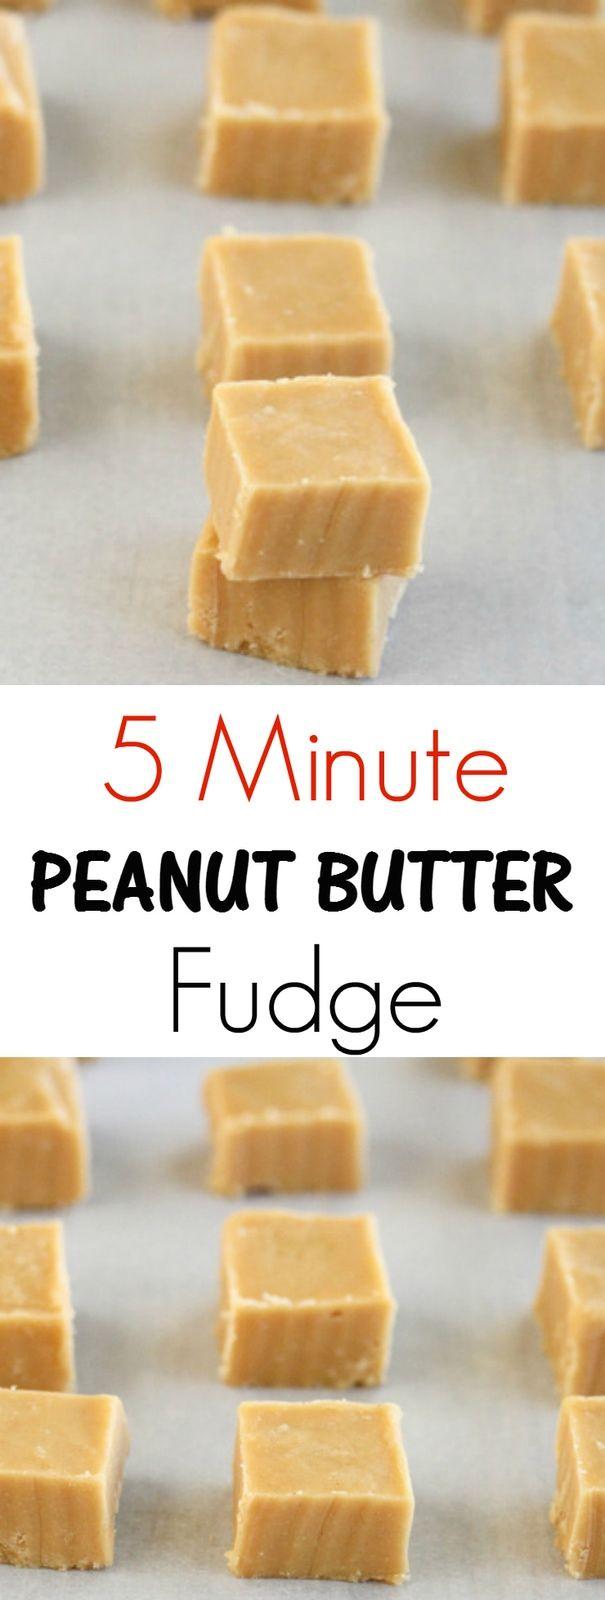 Microwave Peanut Butter Fudge images